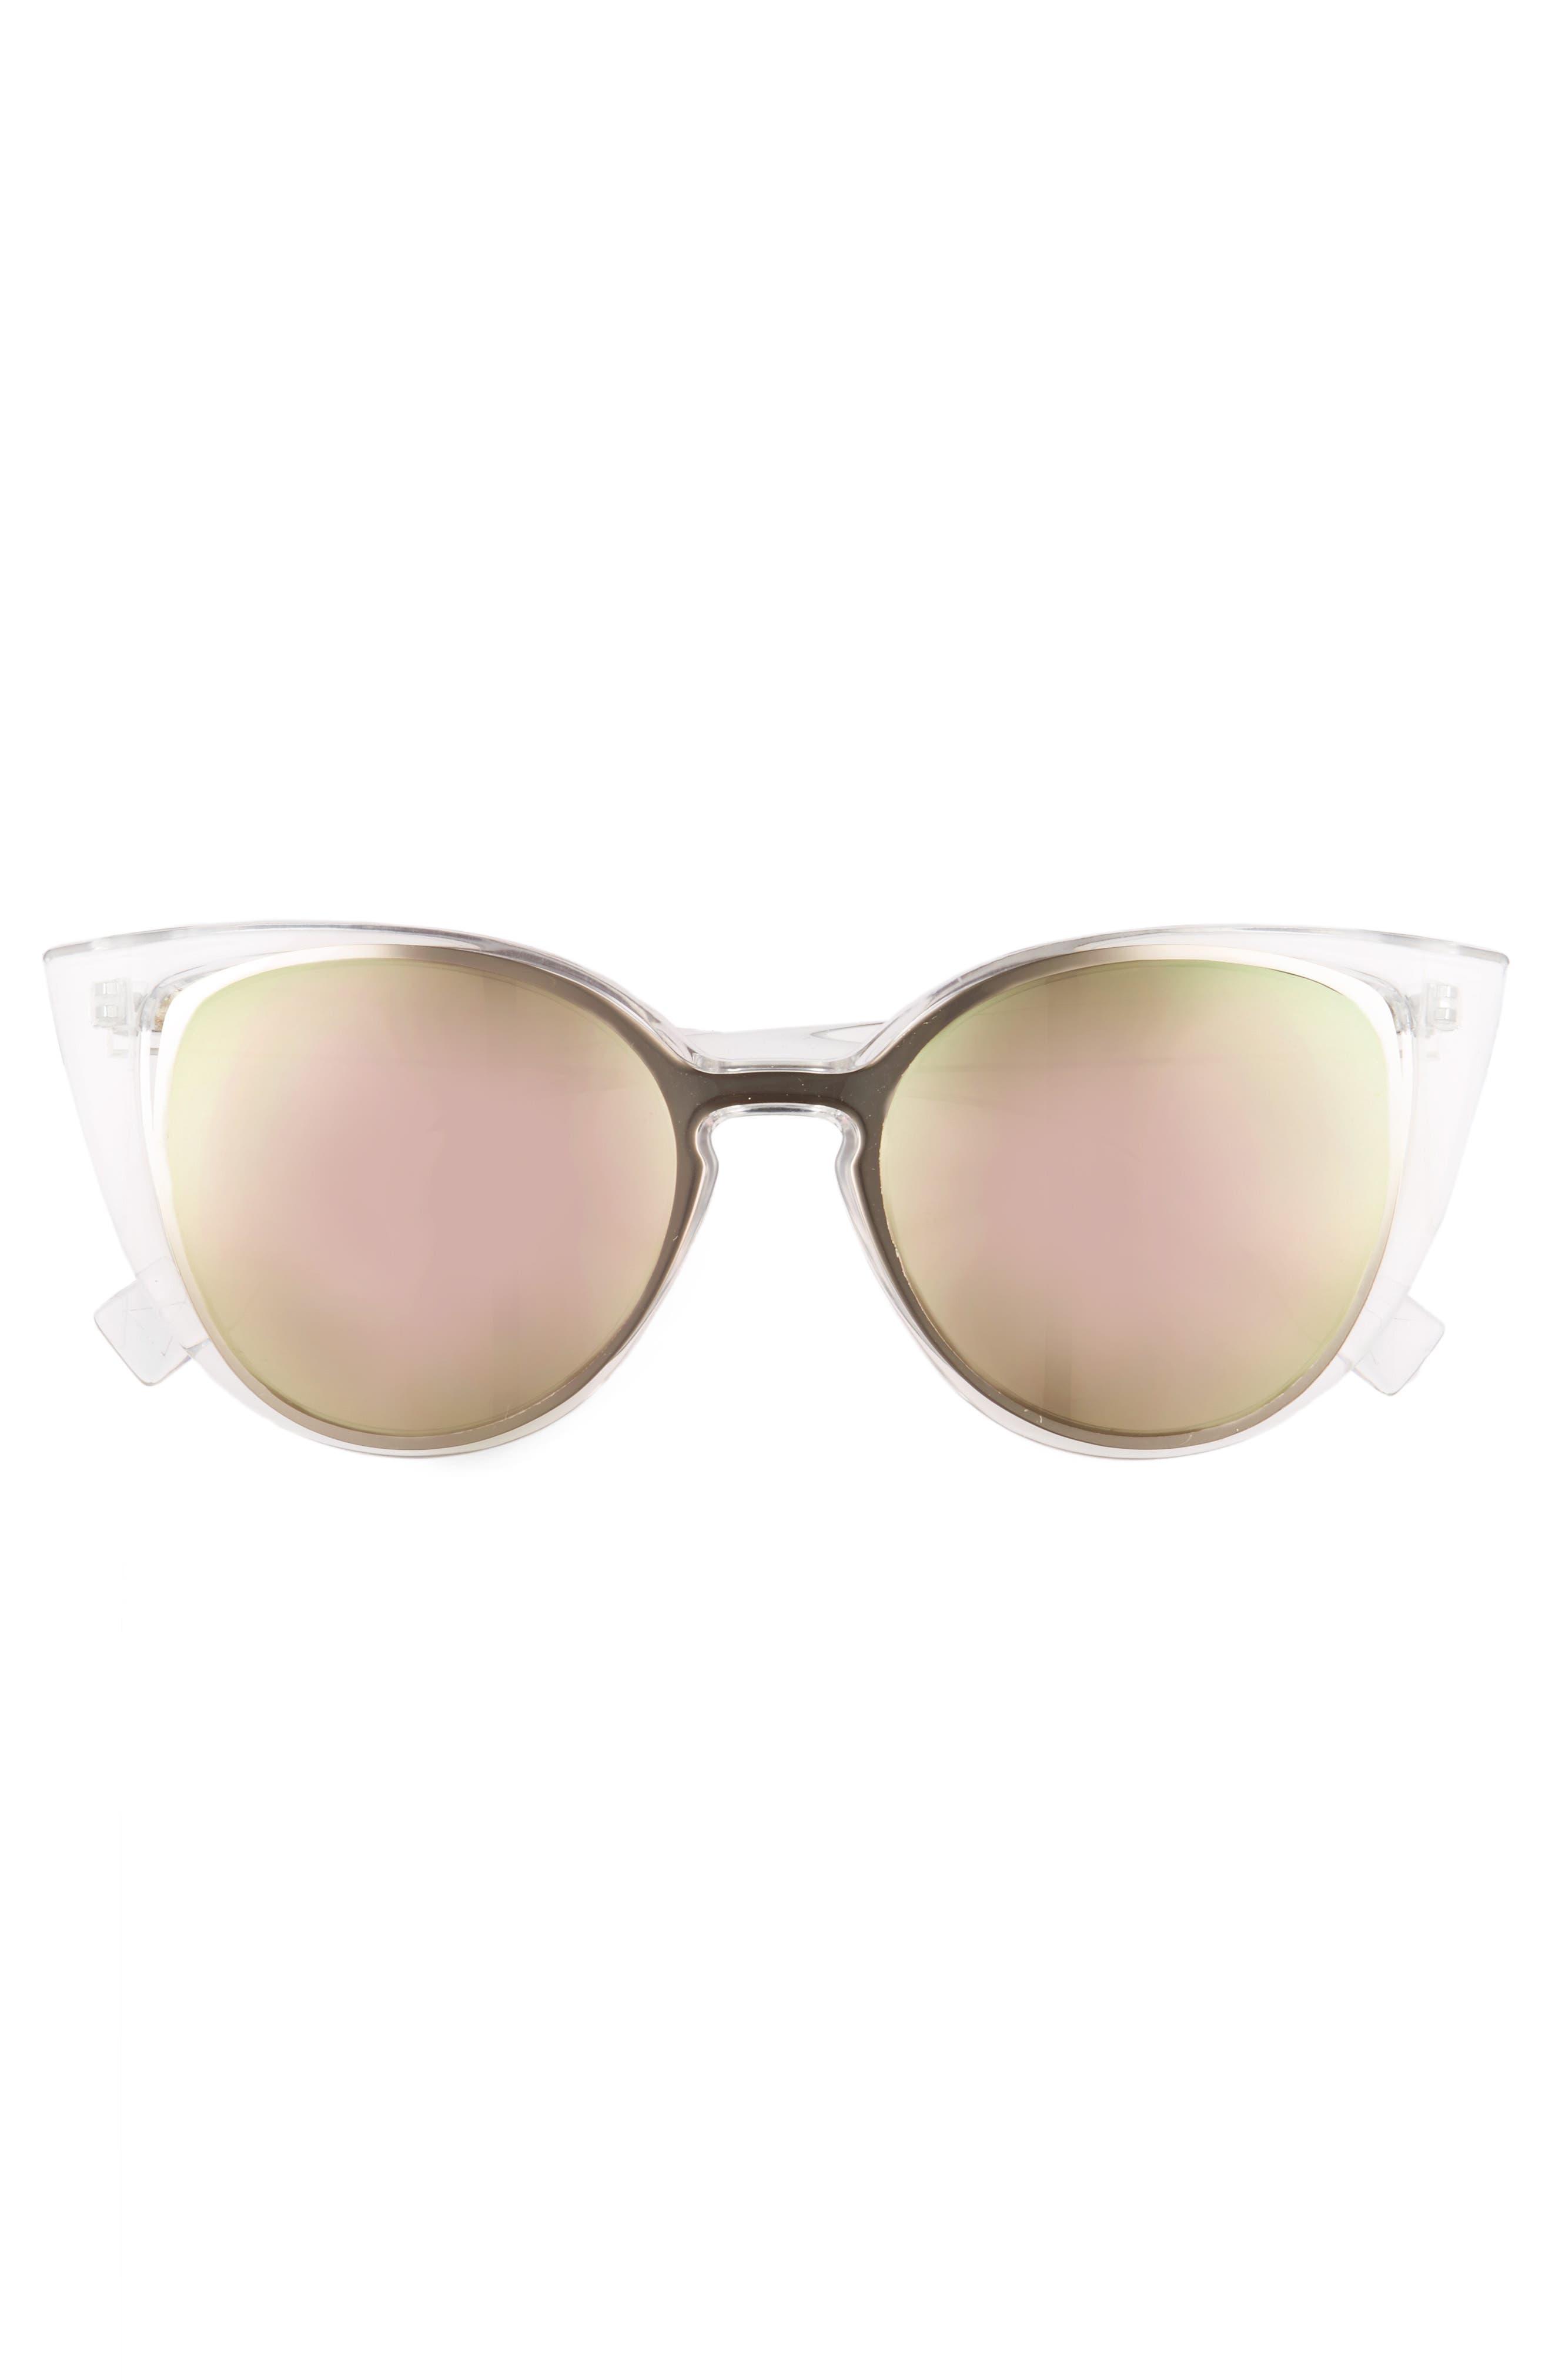 56mm Cutout Cat Eye Sunglasses,                             Alternate thumbnail 3, color,                             Clear/ Multi